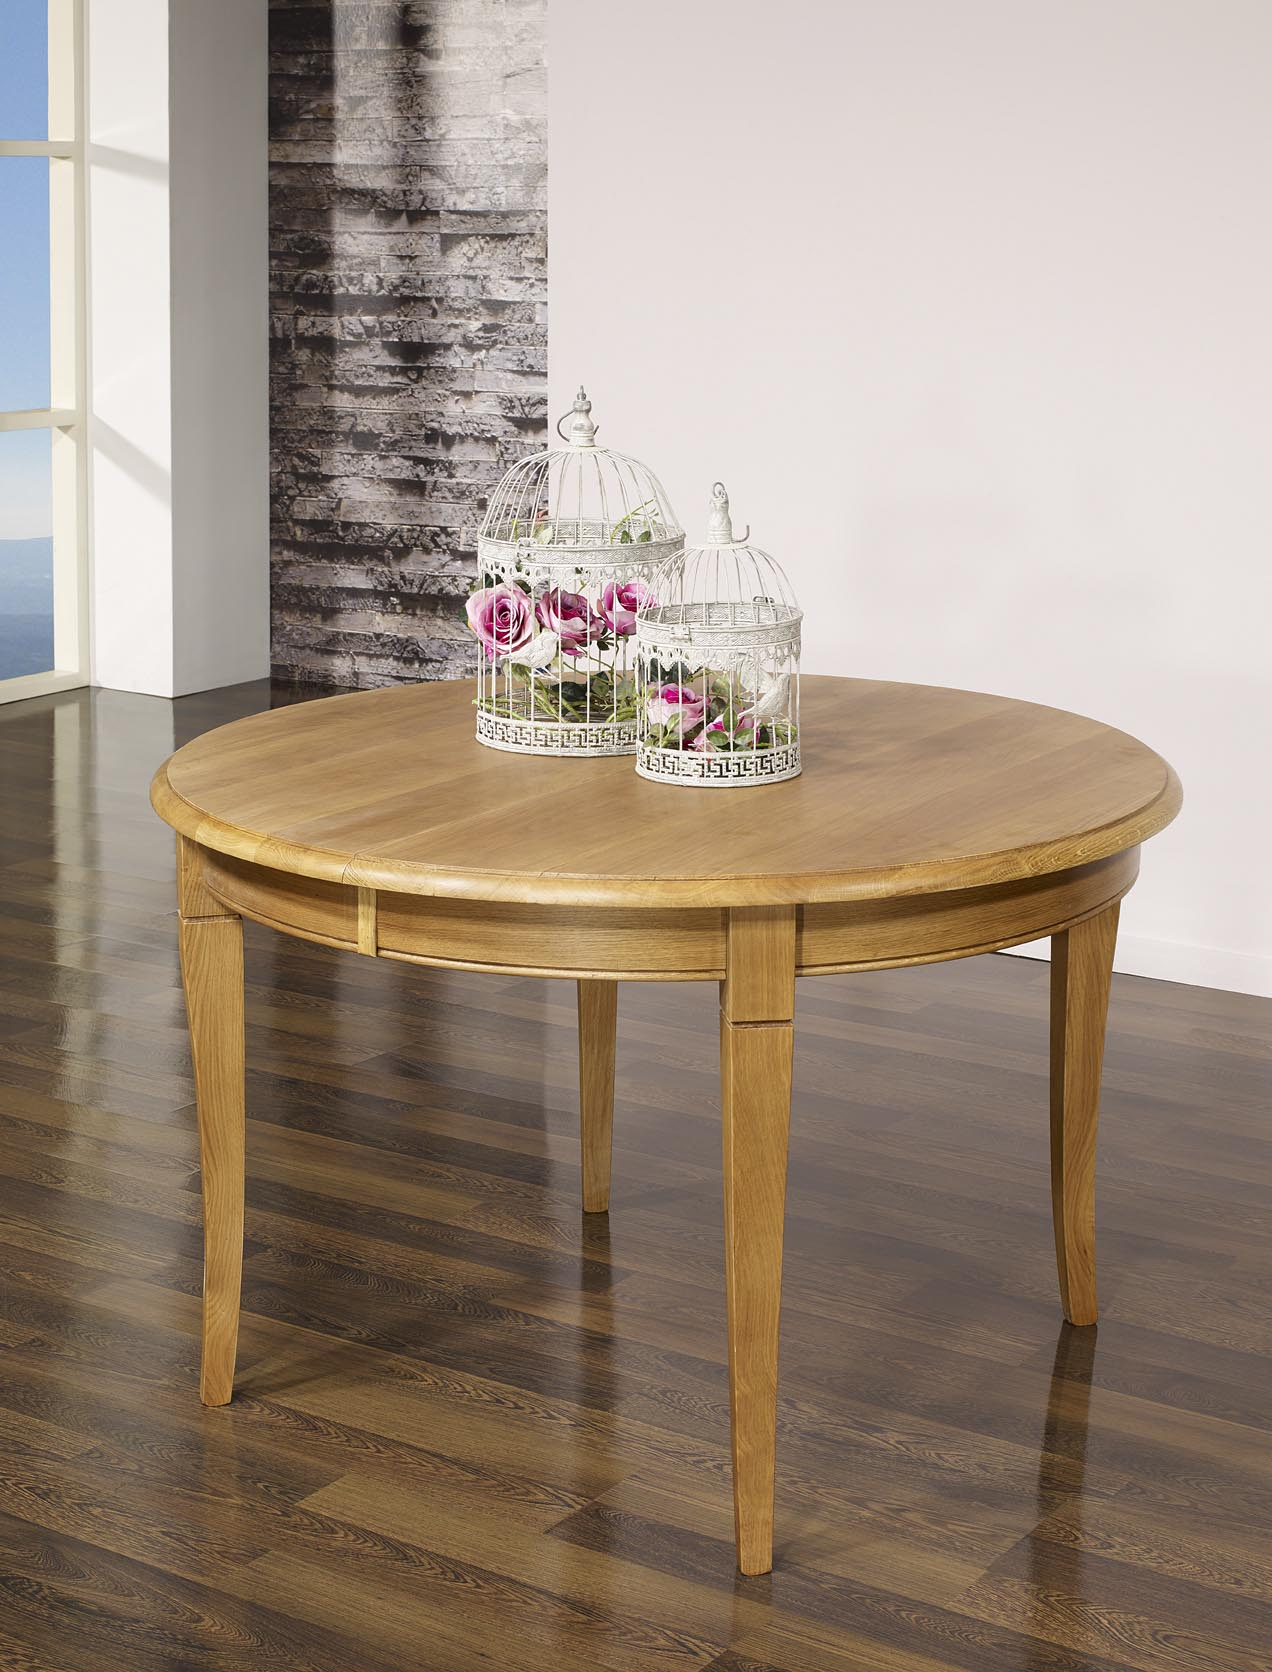 table ronde 120 cm simple d model of cleveland table ronde de salle manger en bois d cm with. Black Bedroom Furniture Sets. Home Design Ideas